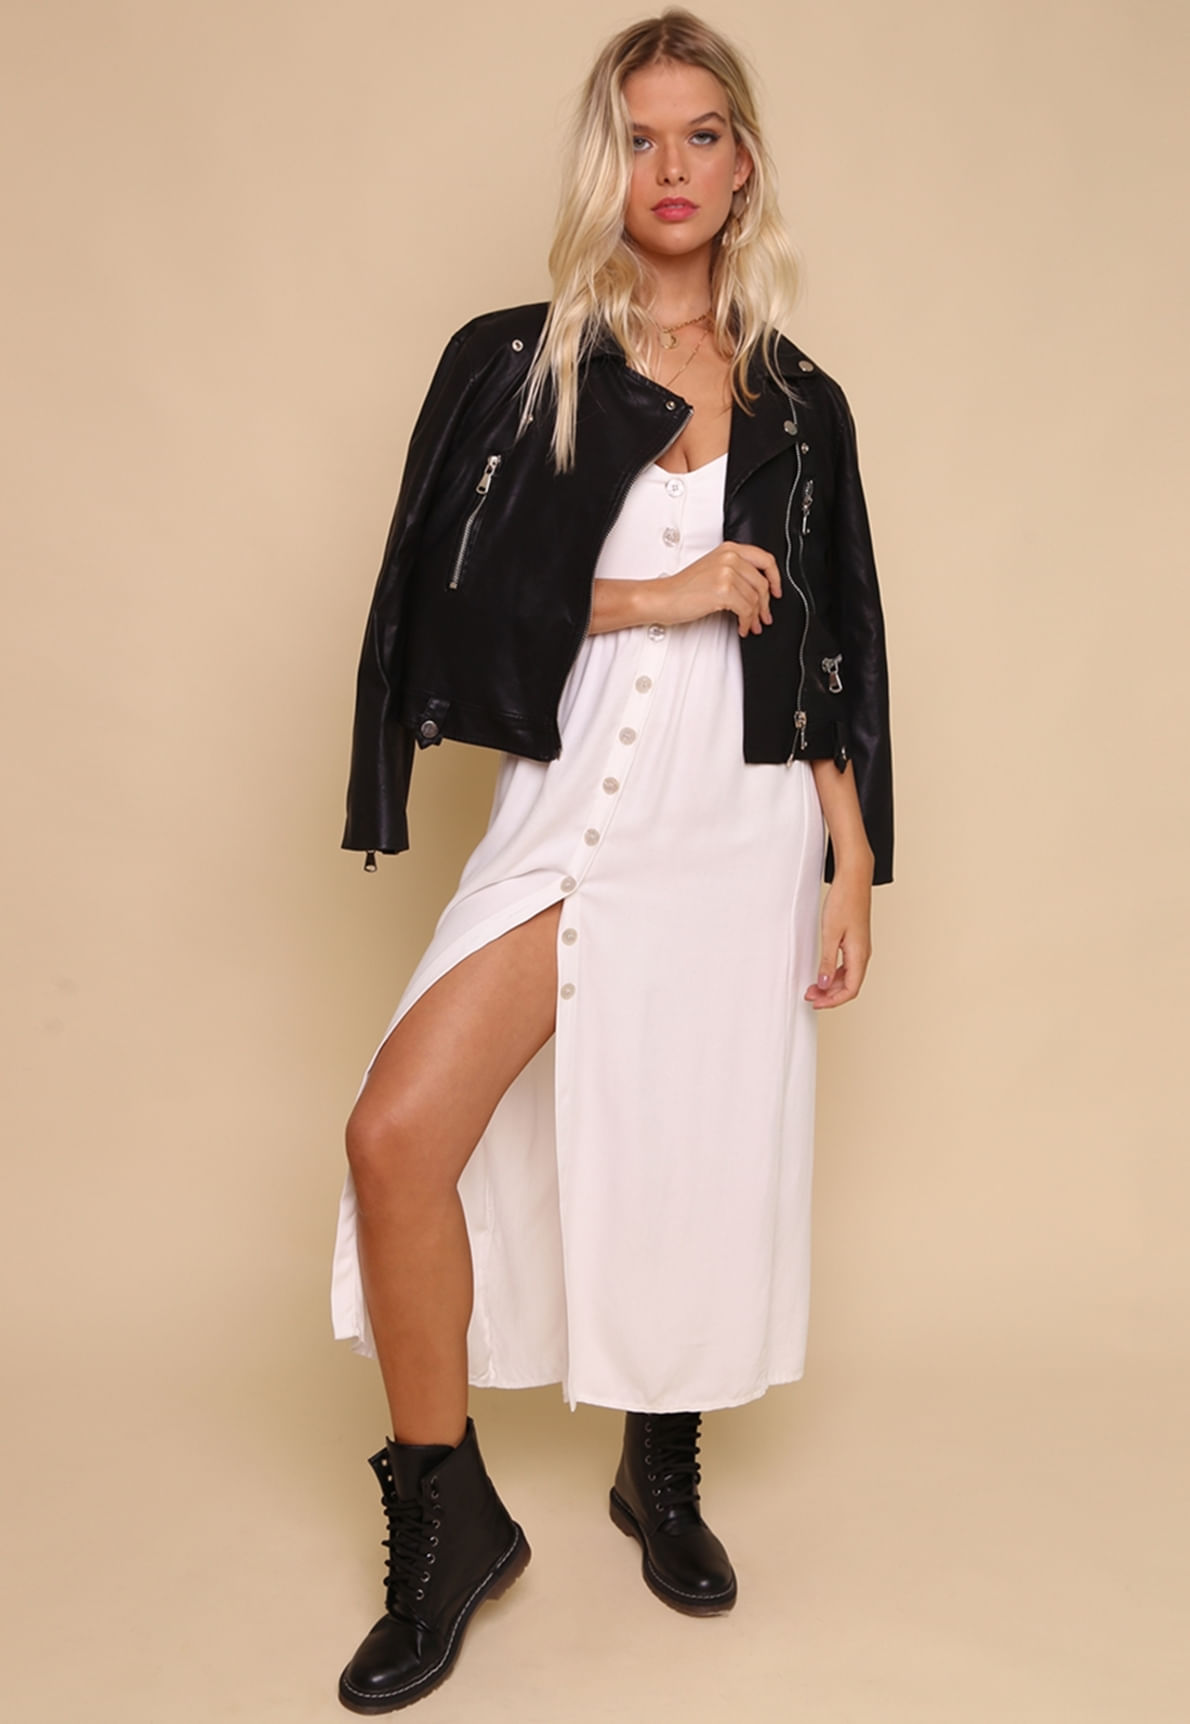 30772-vestido-longo-botoes-branco-amber-mundo-lolita-02